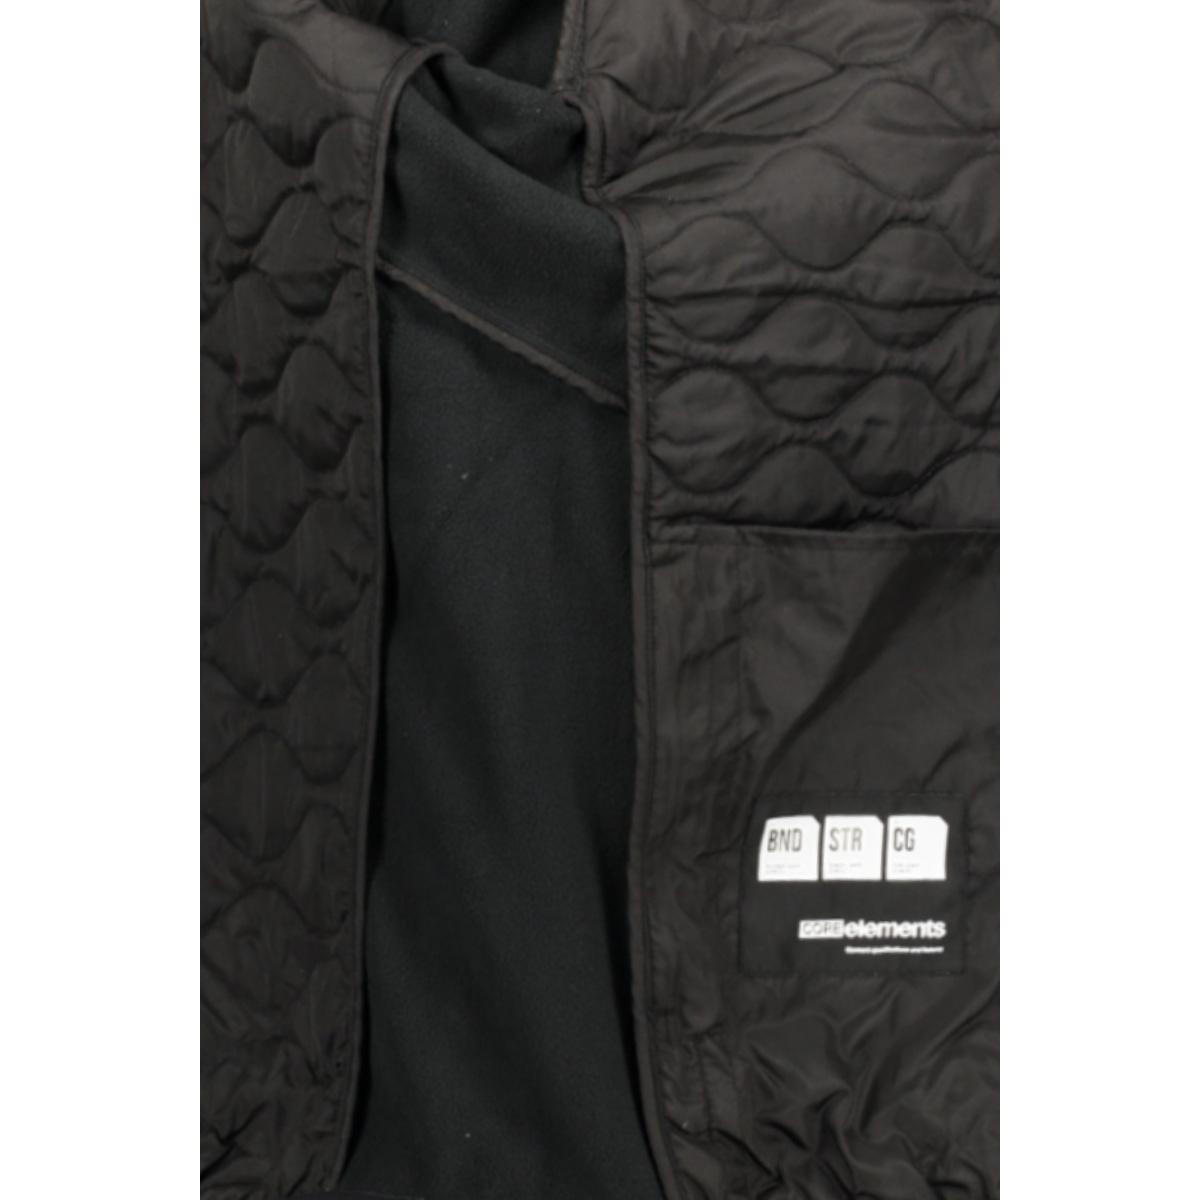 jcomulti quilted bomber 12155315 jack & jones jas black